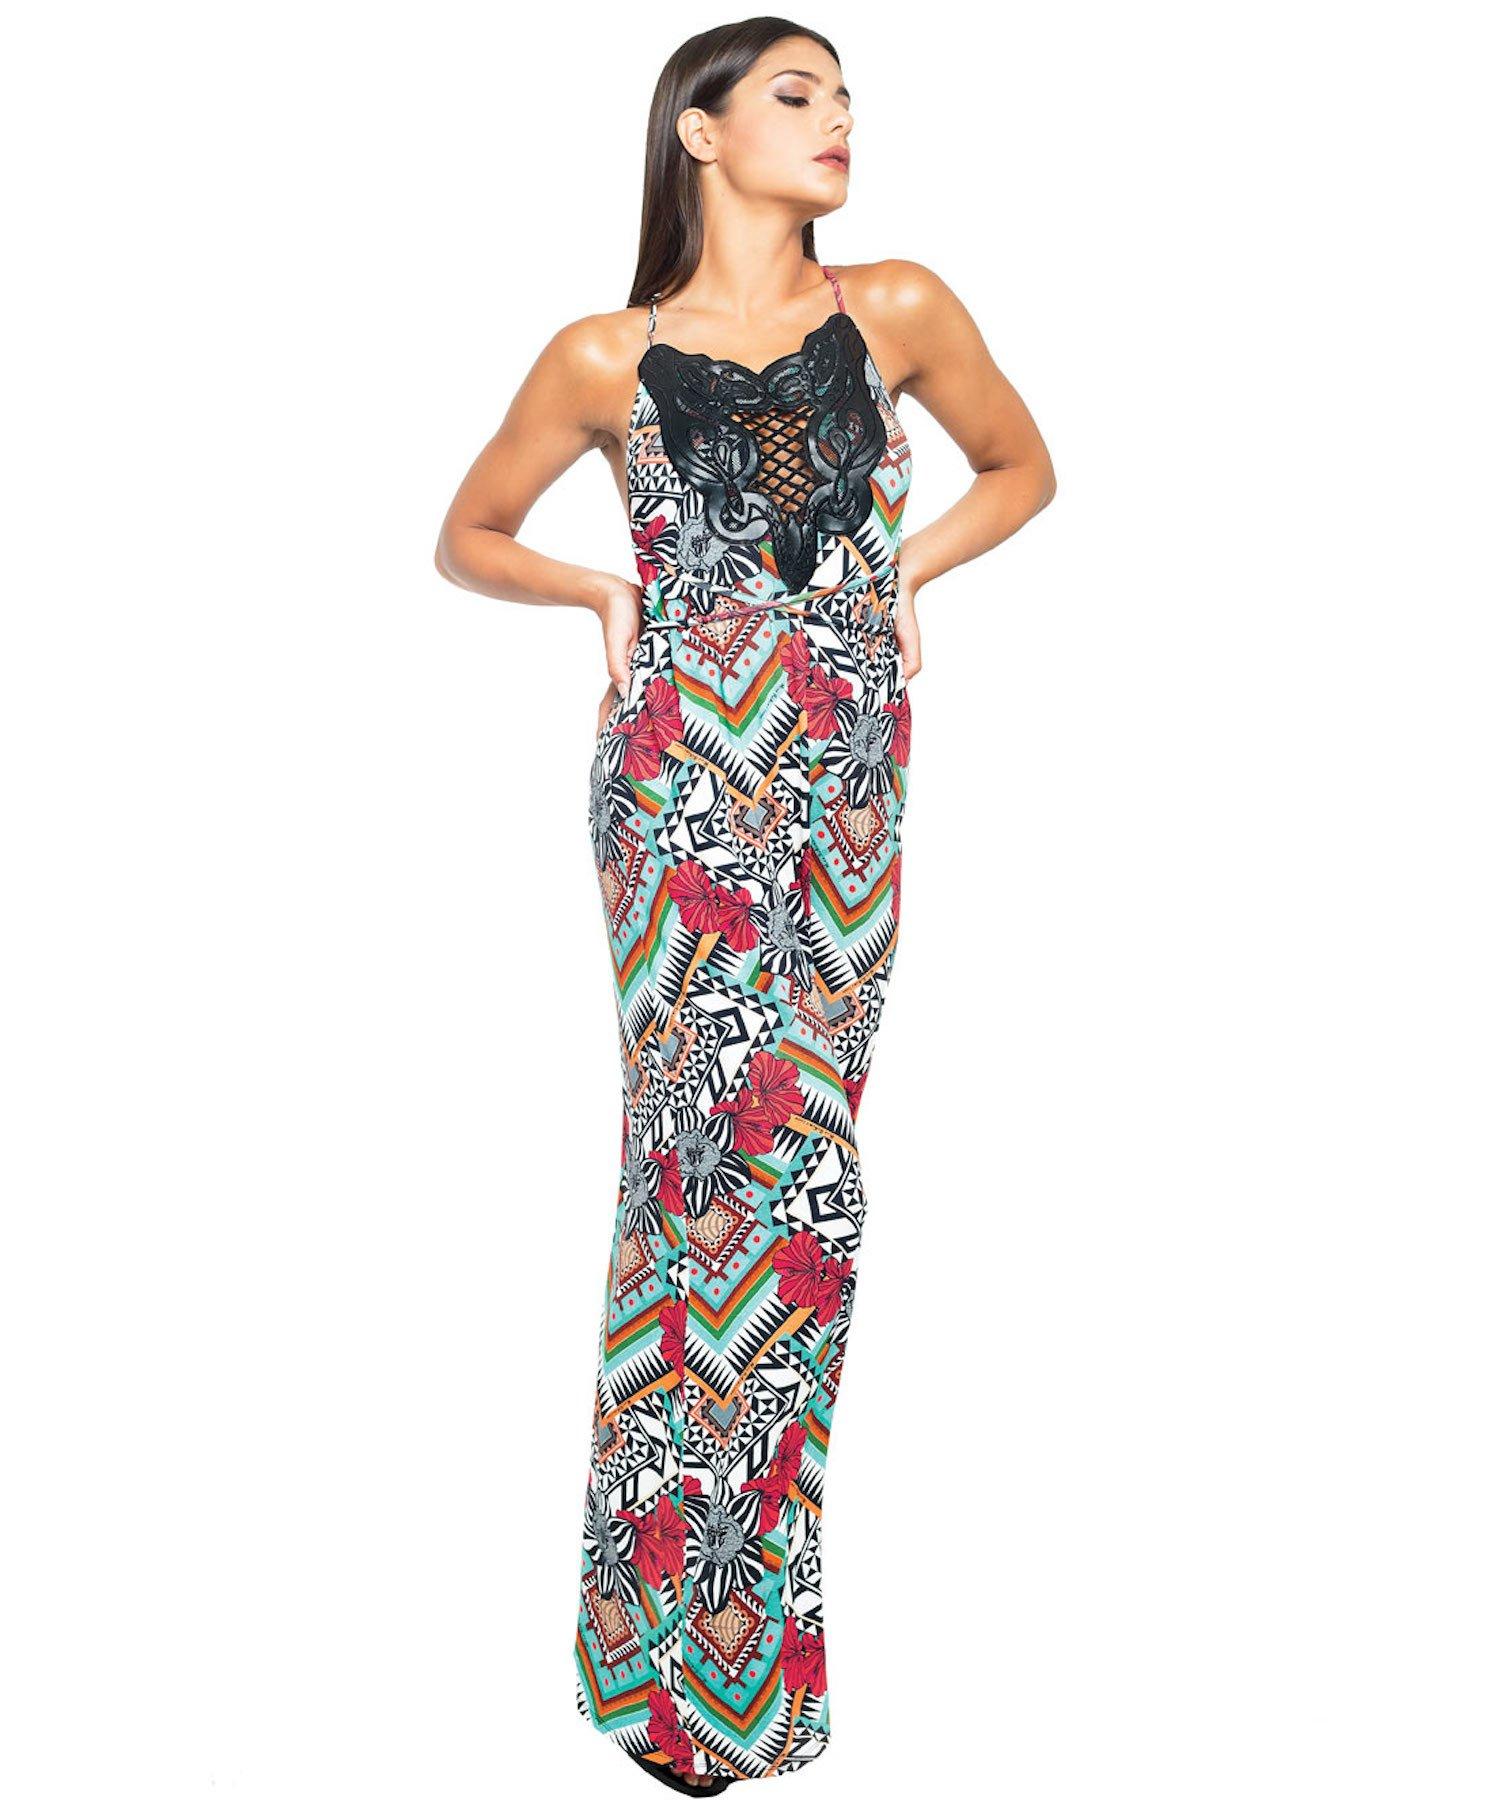 SCUDI LONG DRESS 3715 - Scudi Rosso